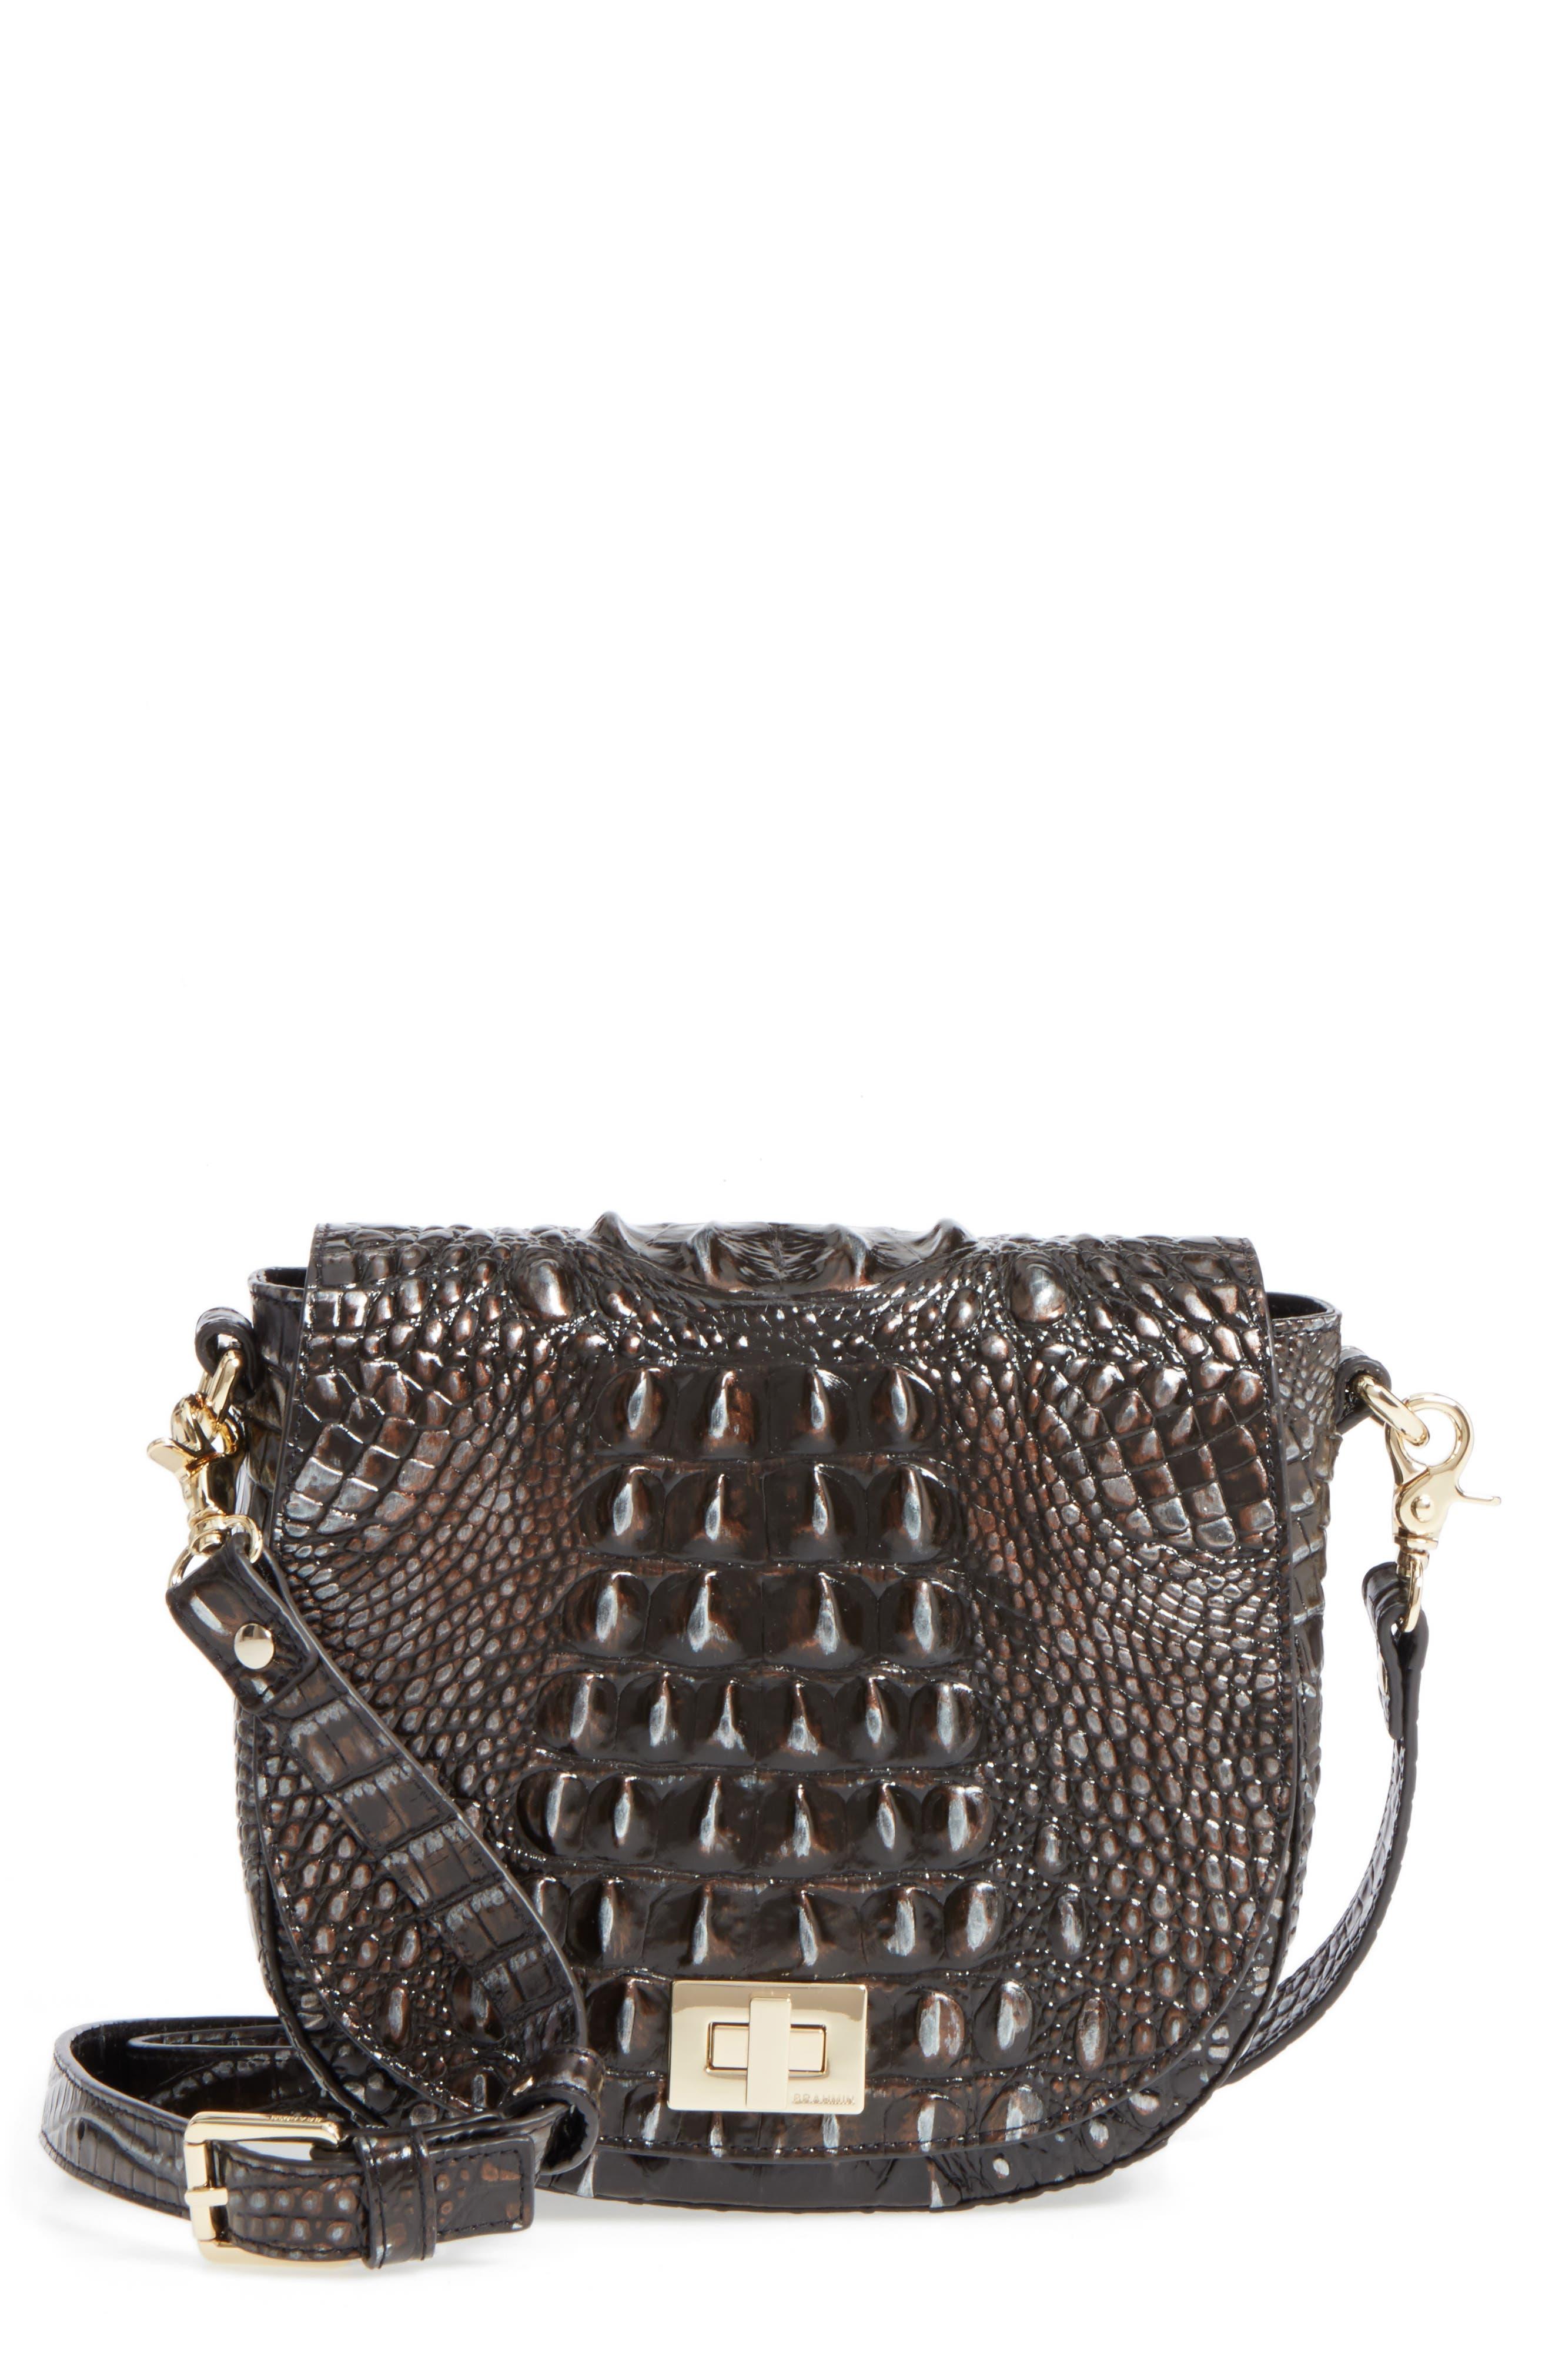 Alternate Image 1 Selected - Brahmin Mini Sonny Leather Crossbody Bag